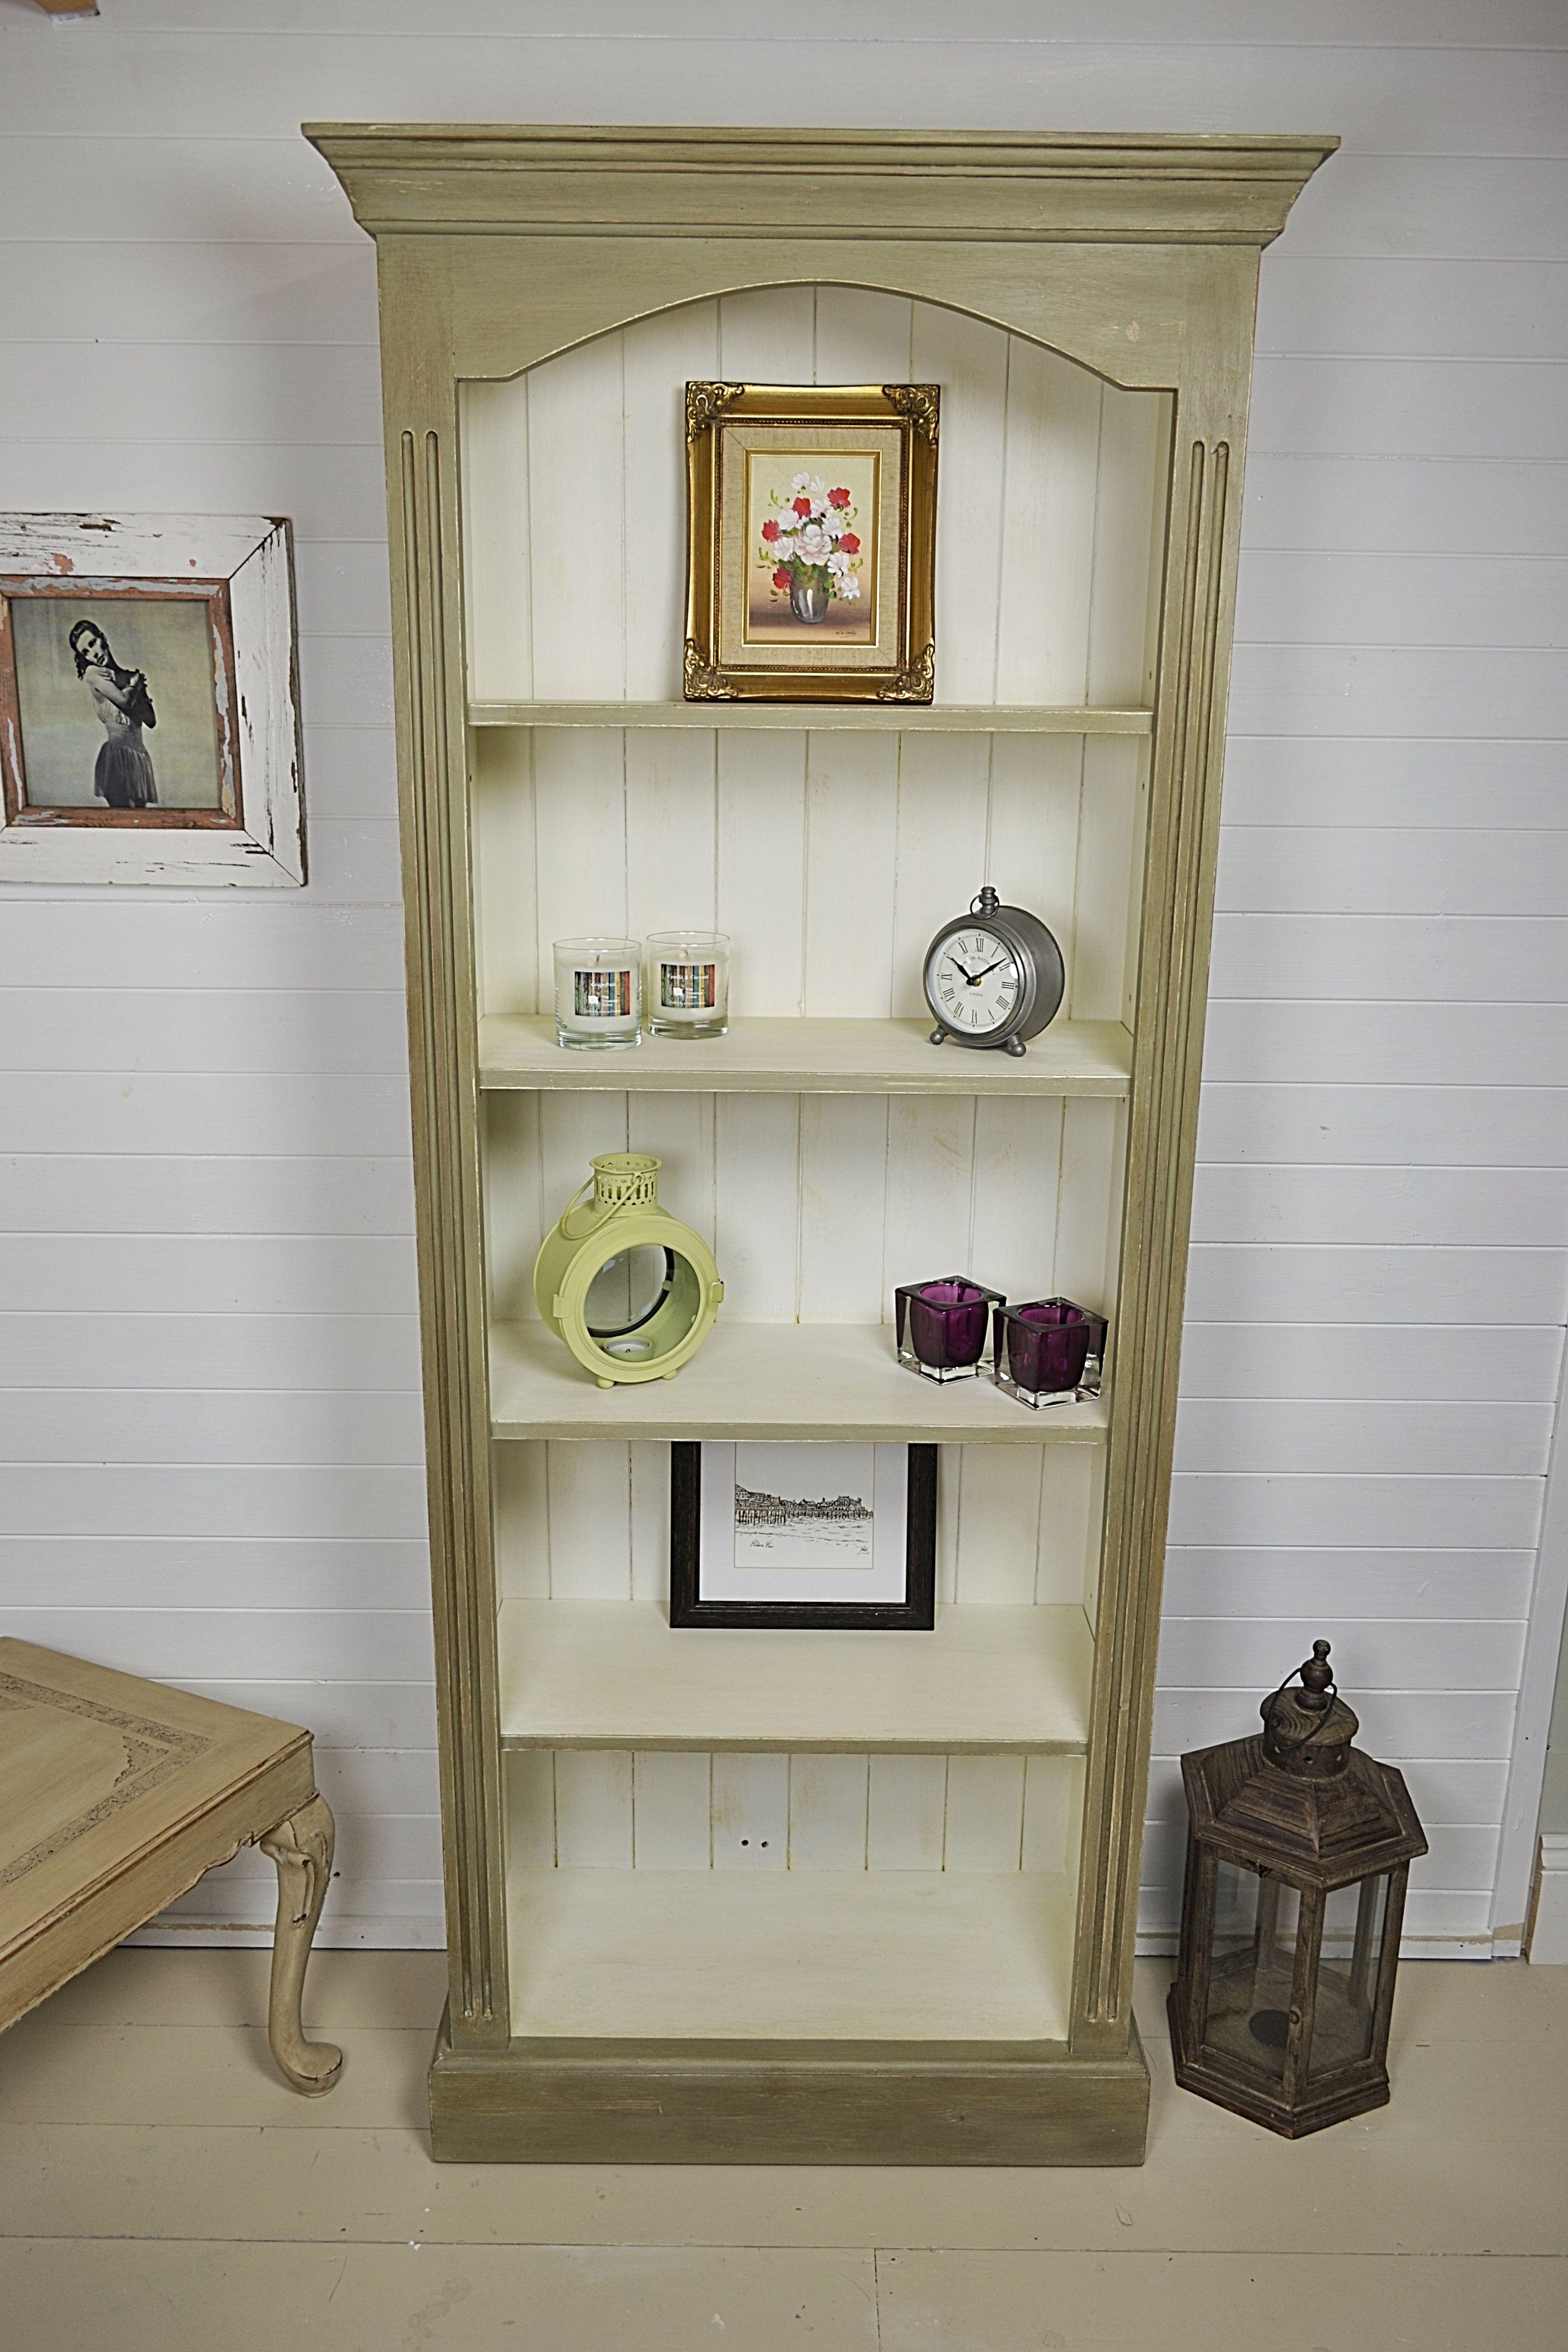 Slimline Bedroom Furniture This Slimline Bookcase Has Elegant Lines And Plenty Of Storage